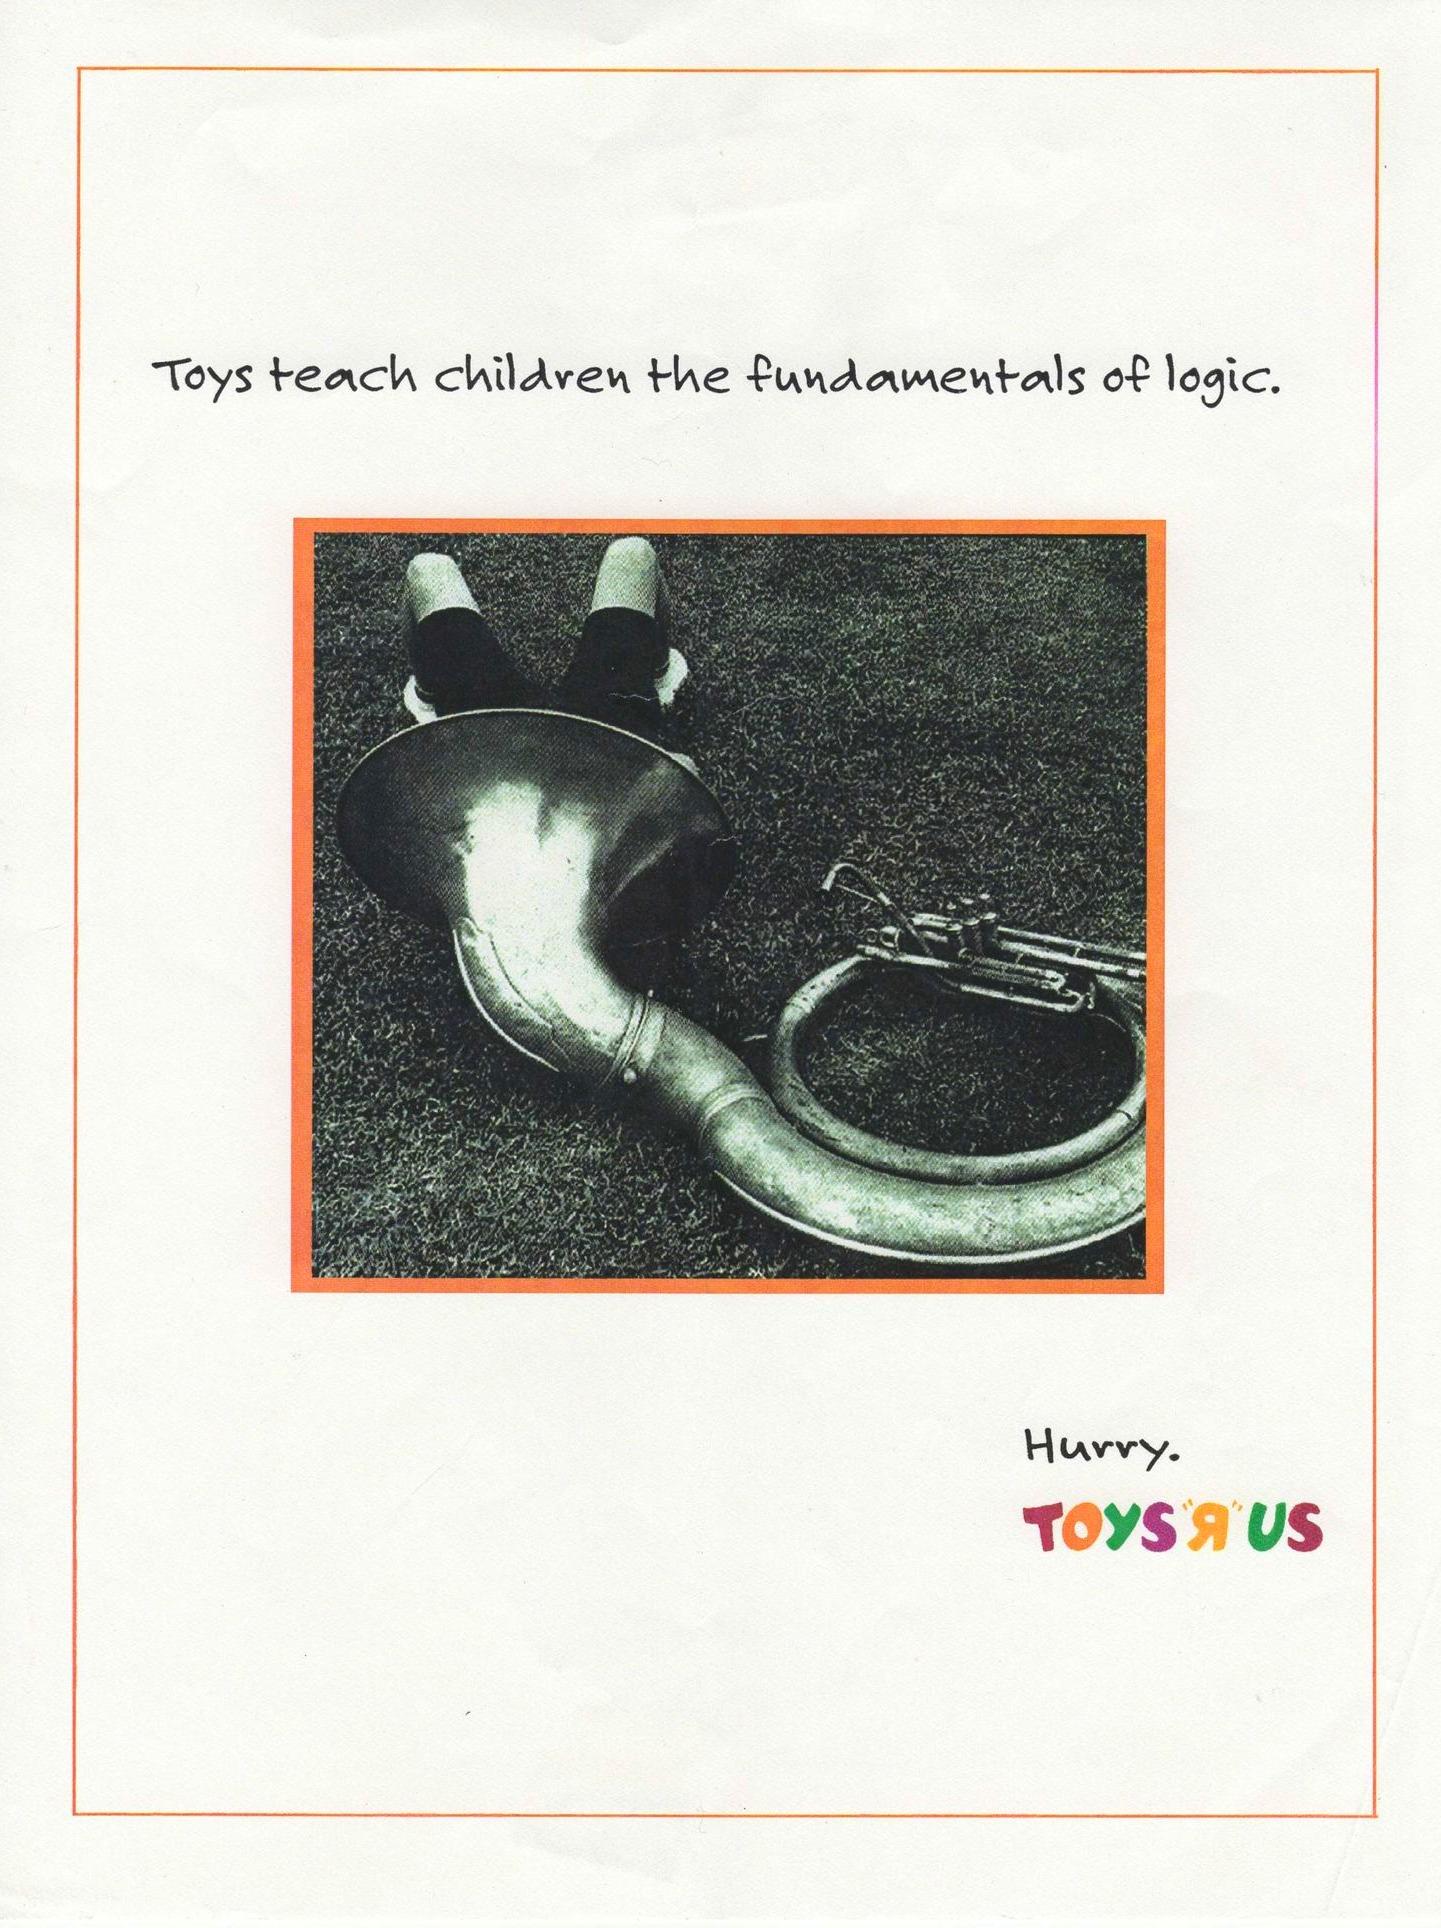 Toys R Us 2